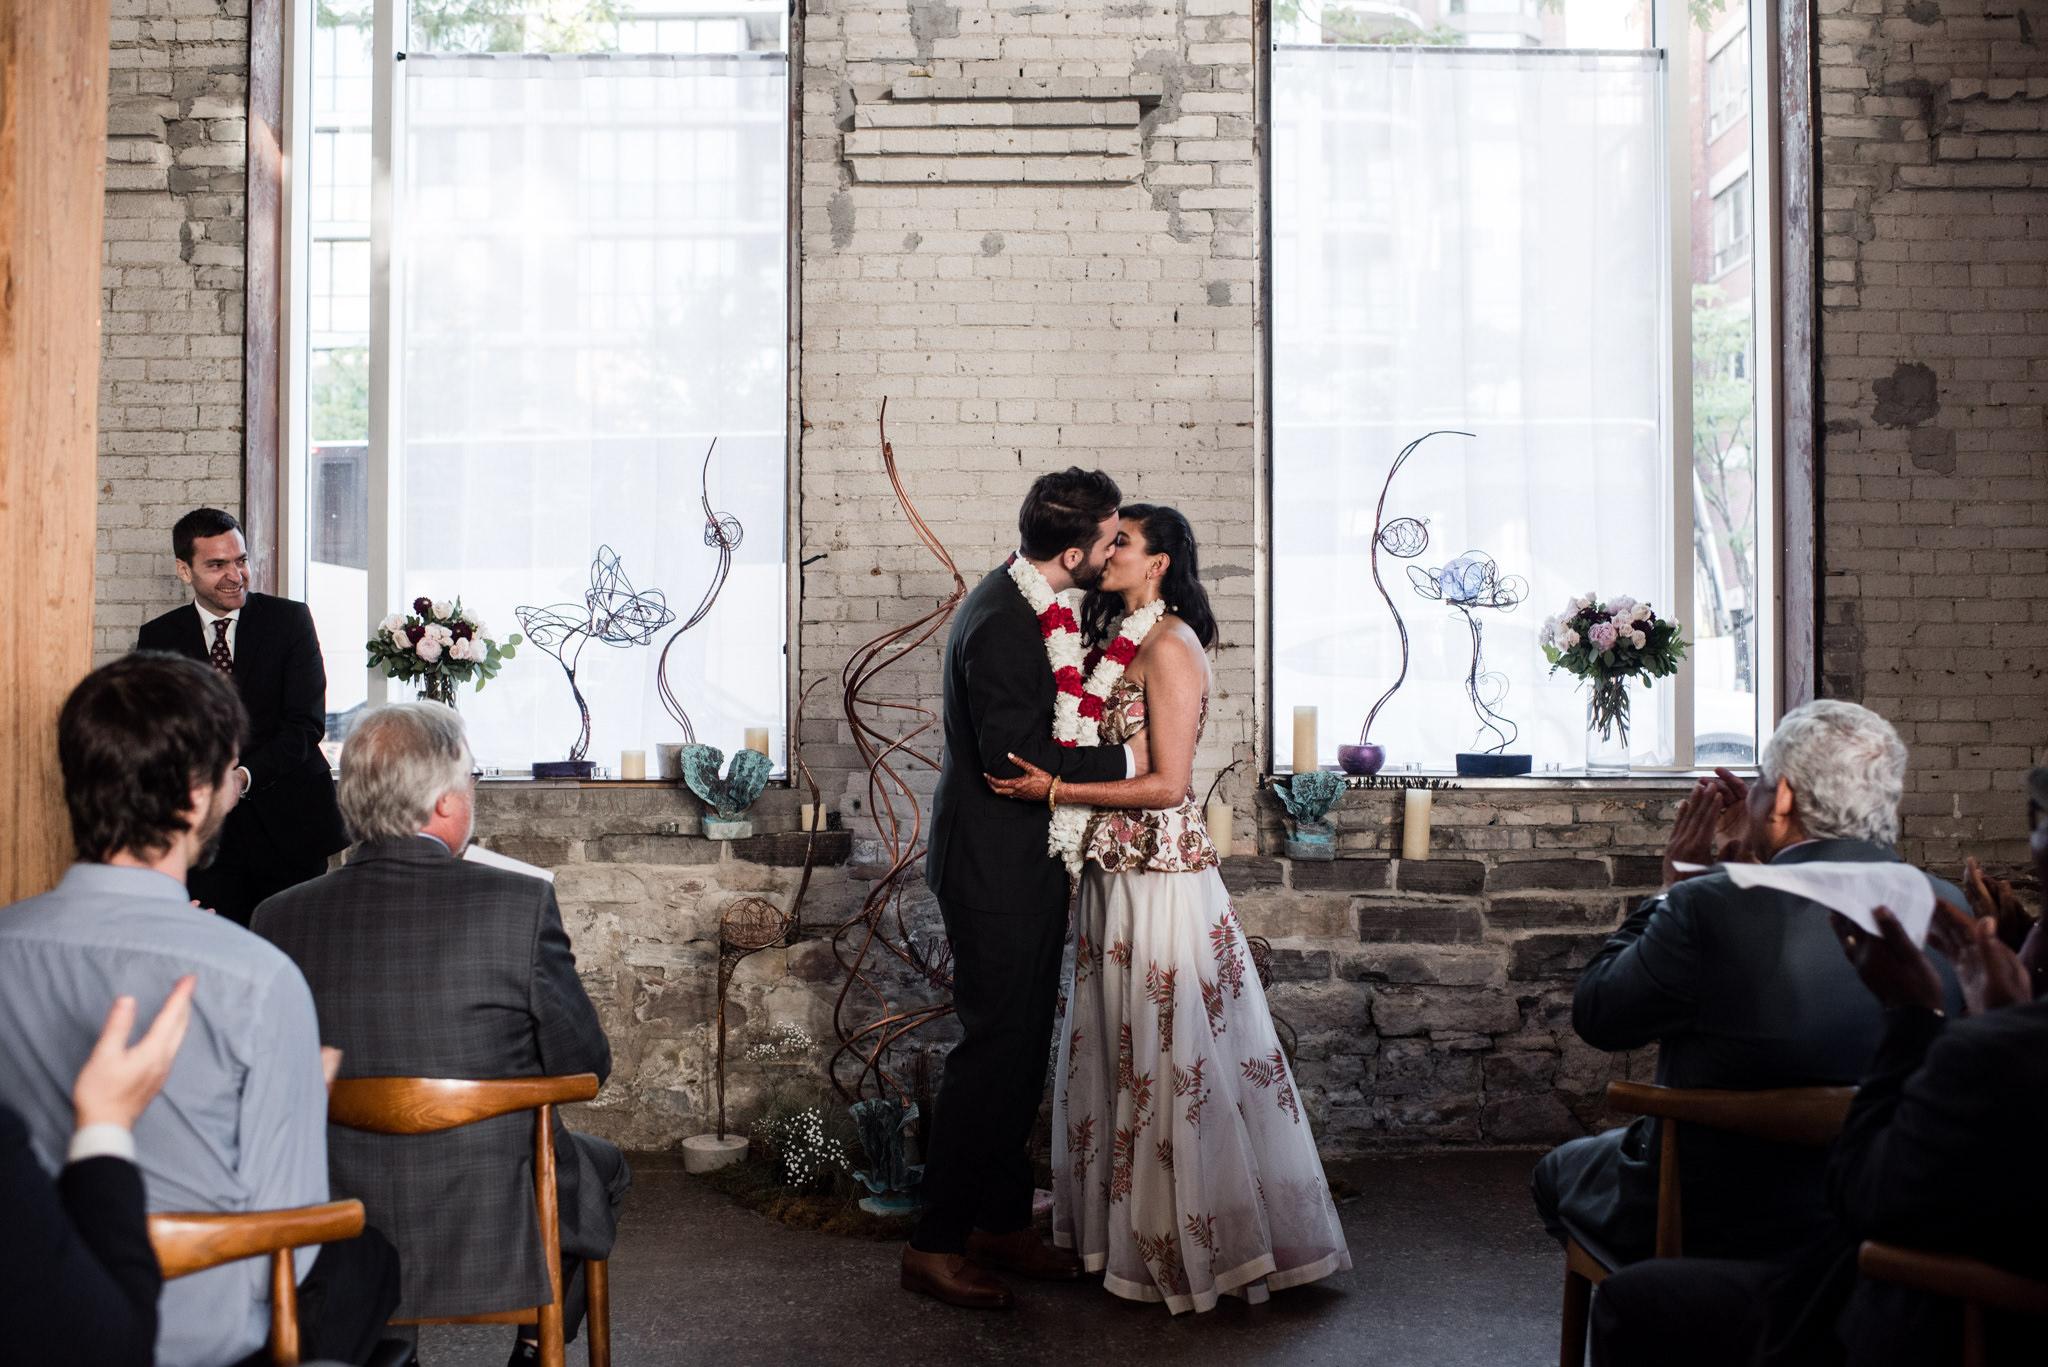 068-wedding-ceremony-parents-reactions-documentary-photo-hotel-ocho.jpg